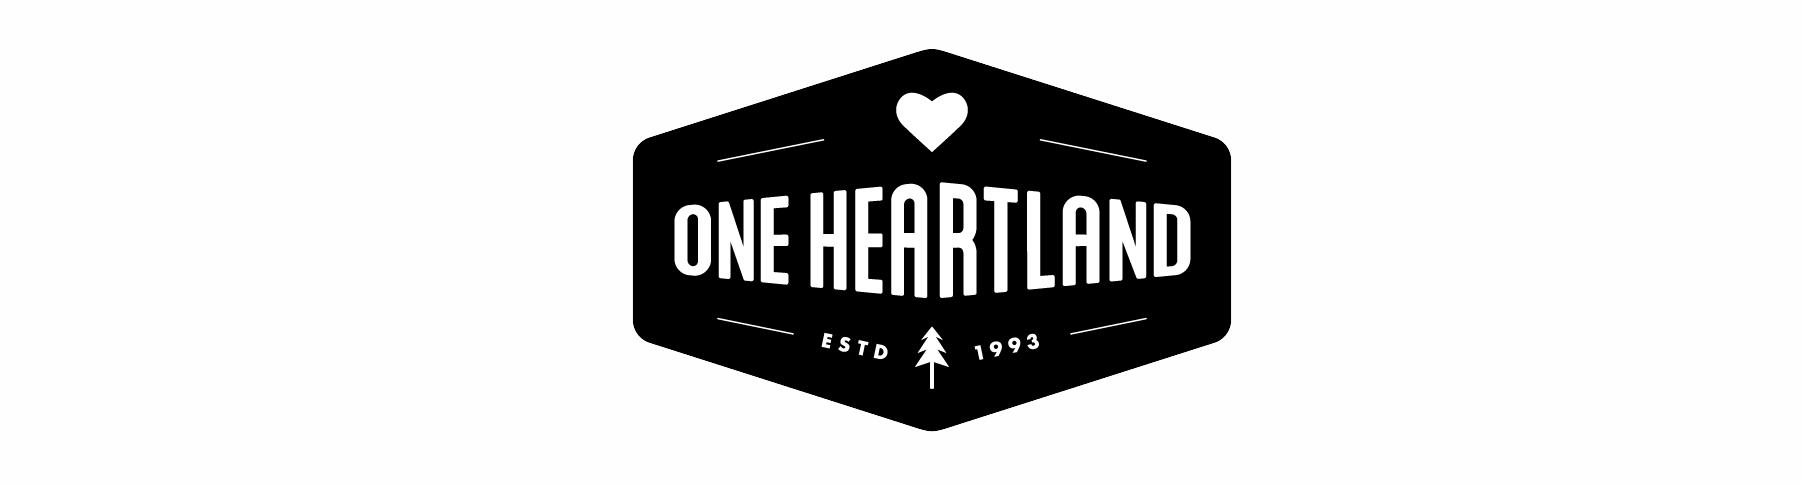 One Heartland 2.jpg